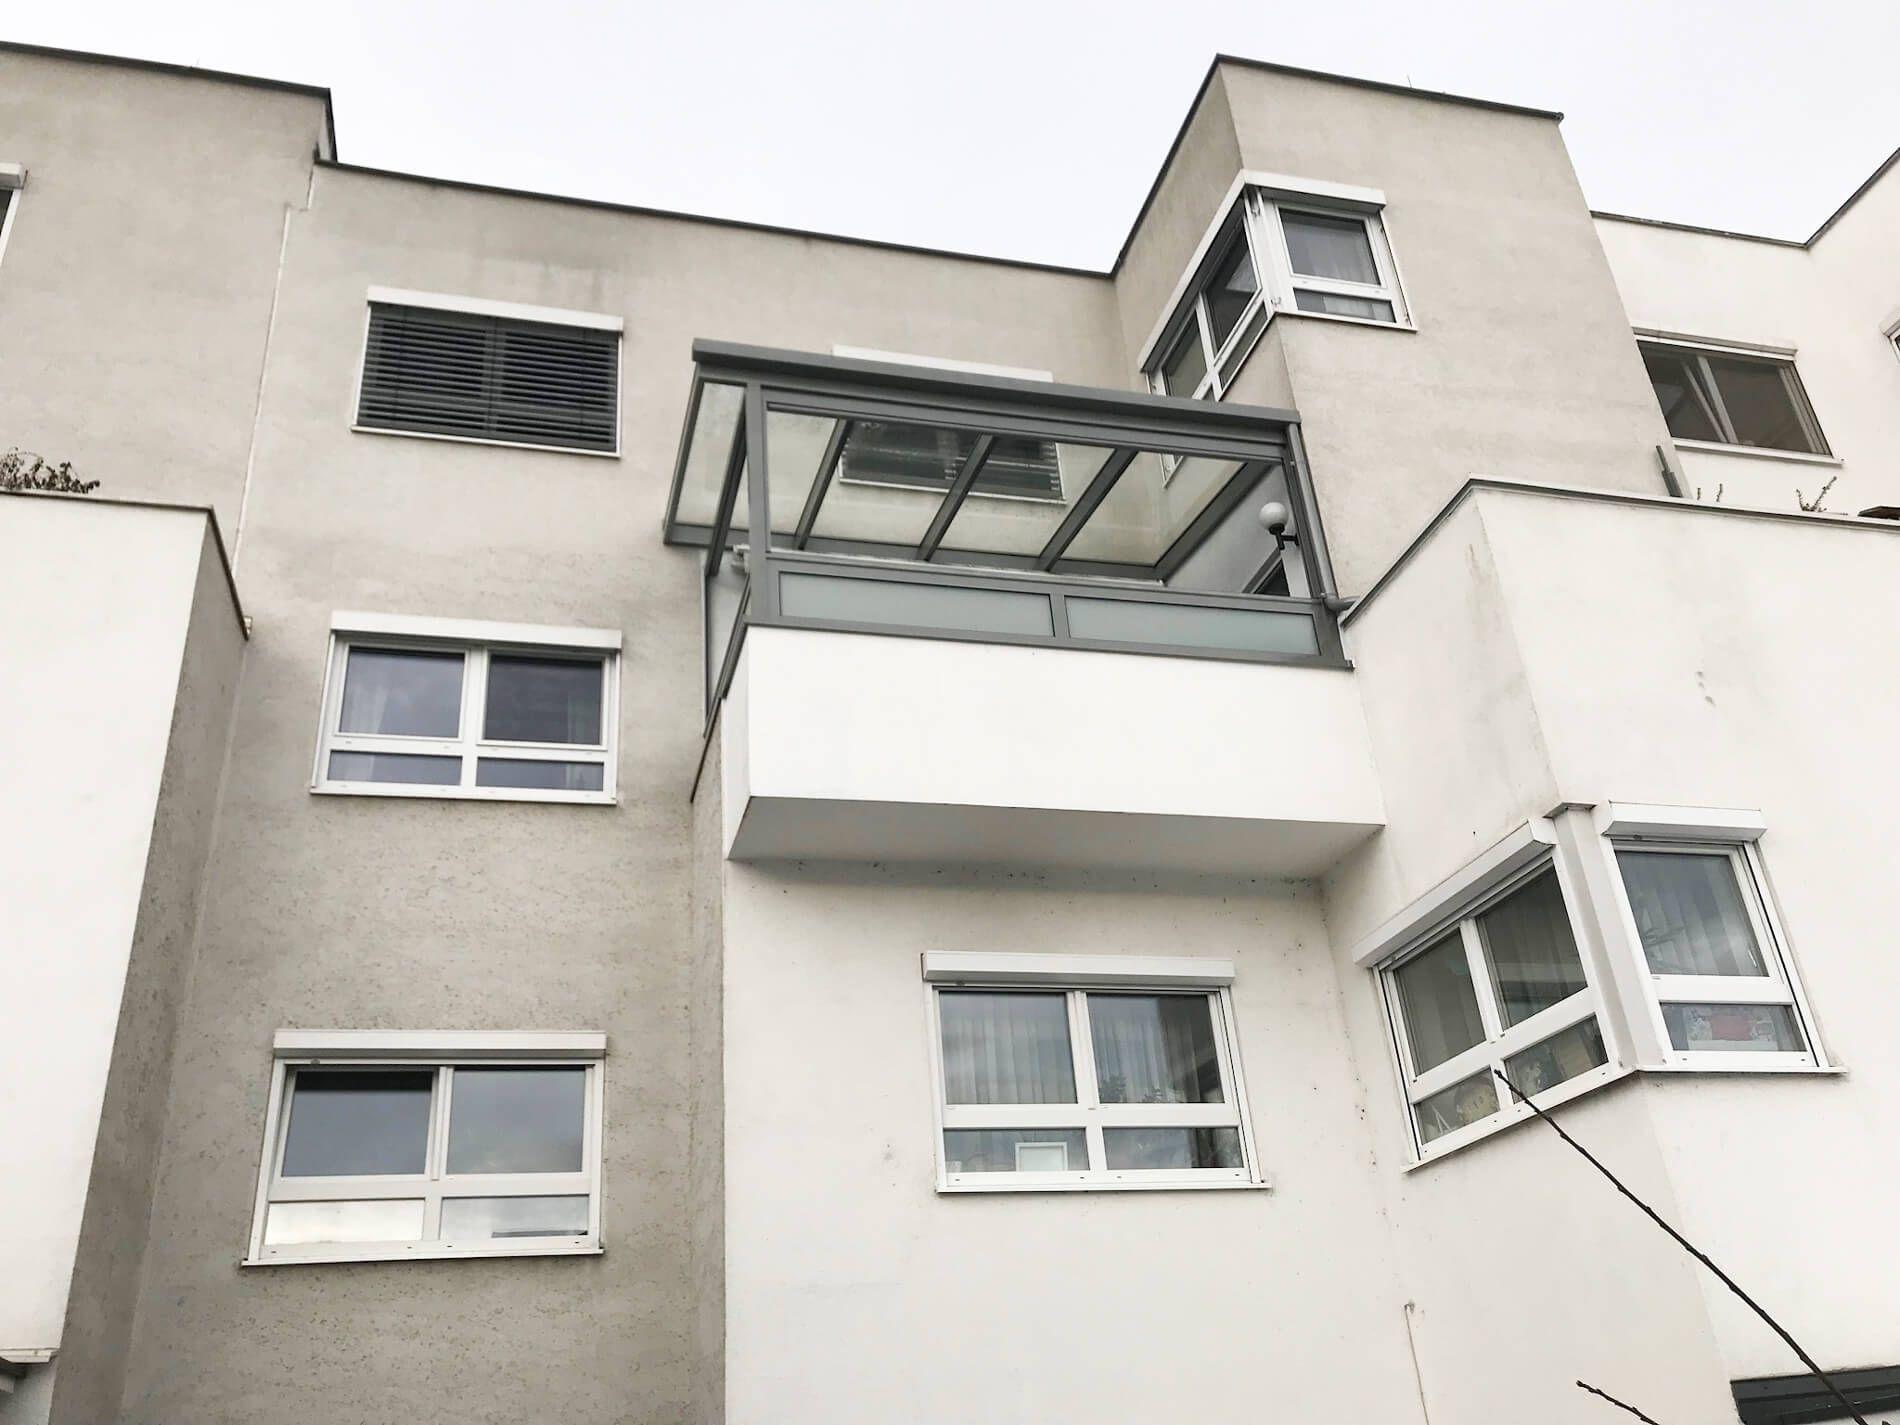 Balkonüberdachung Alu Glas | Schmidinger Projekte ...